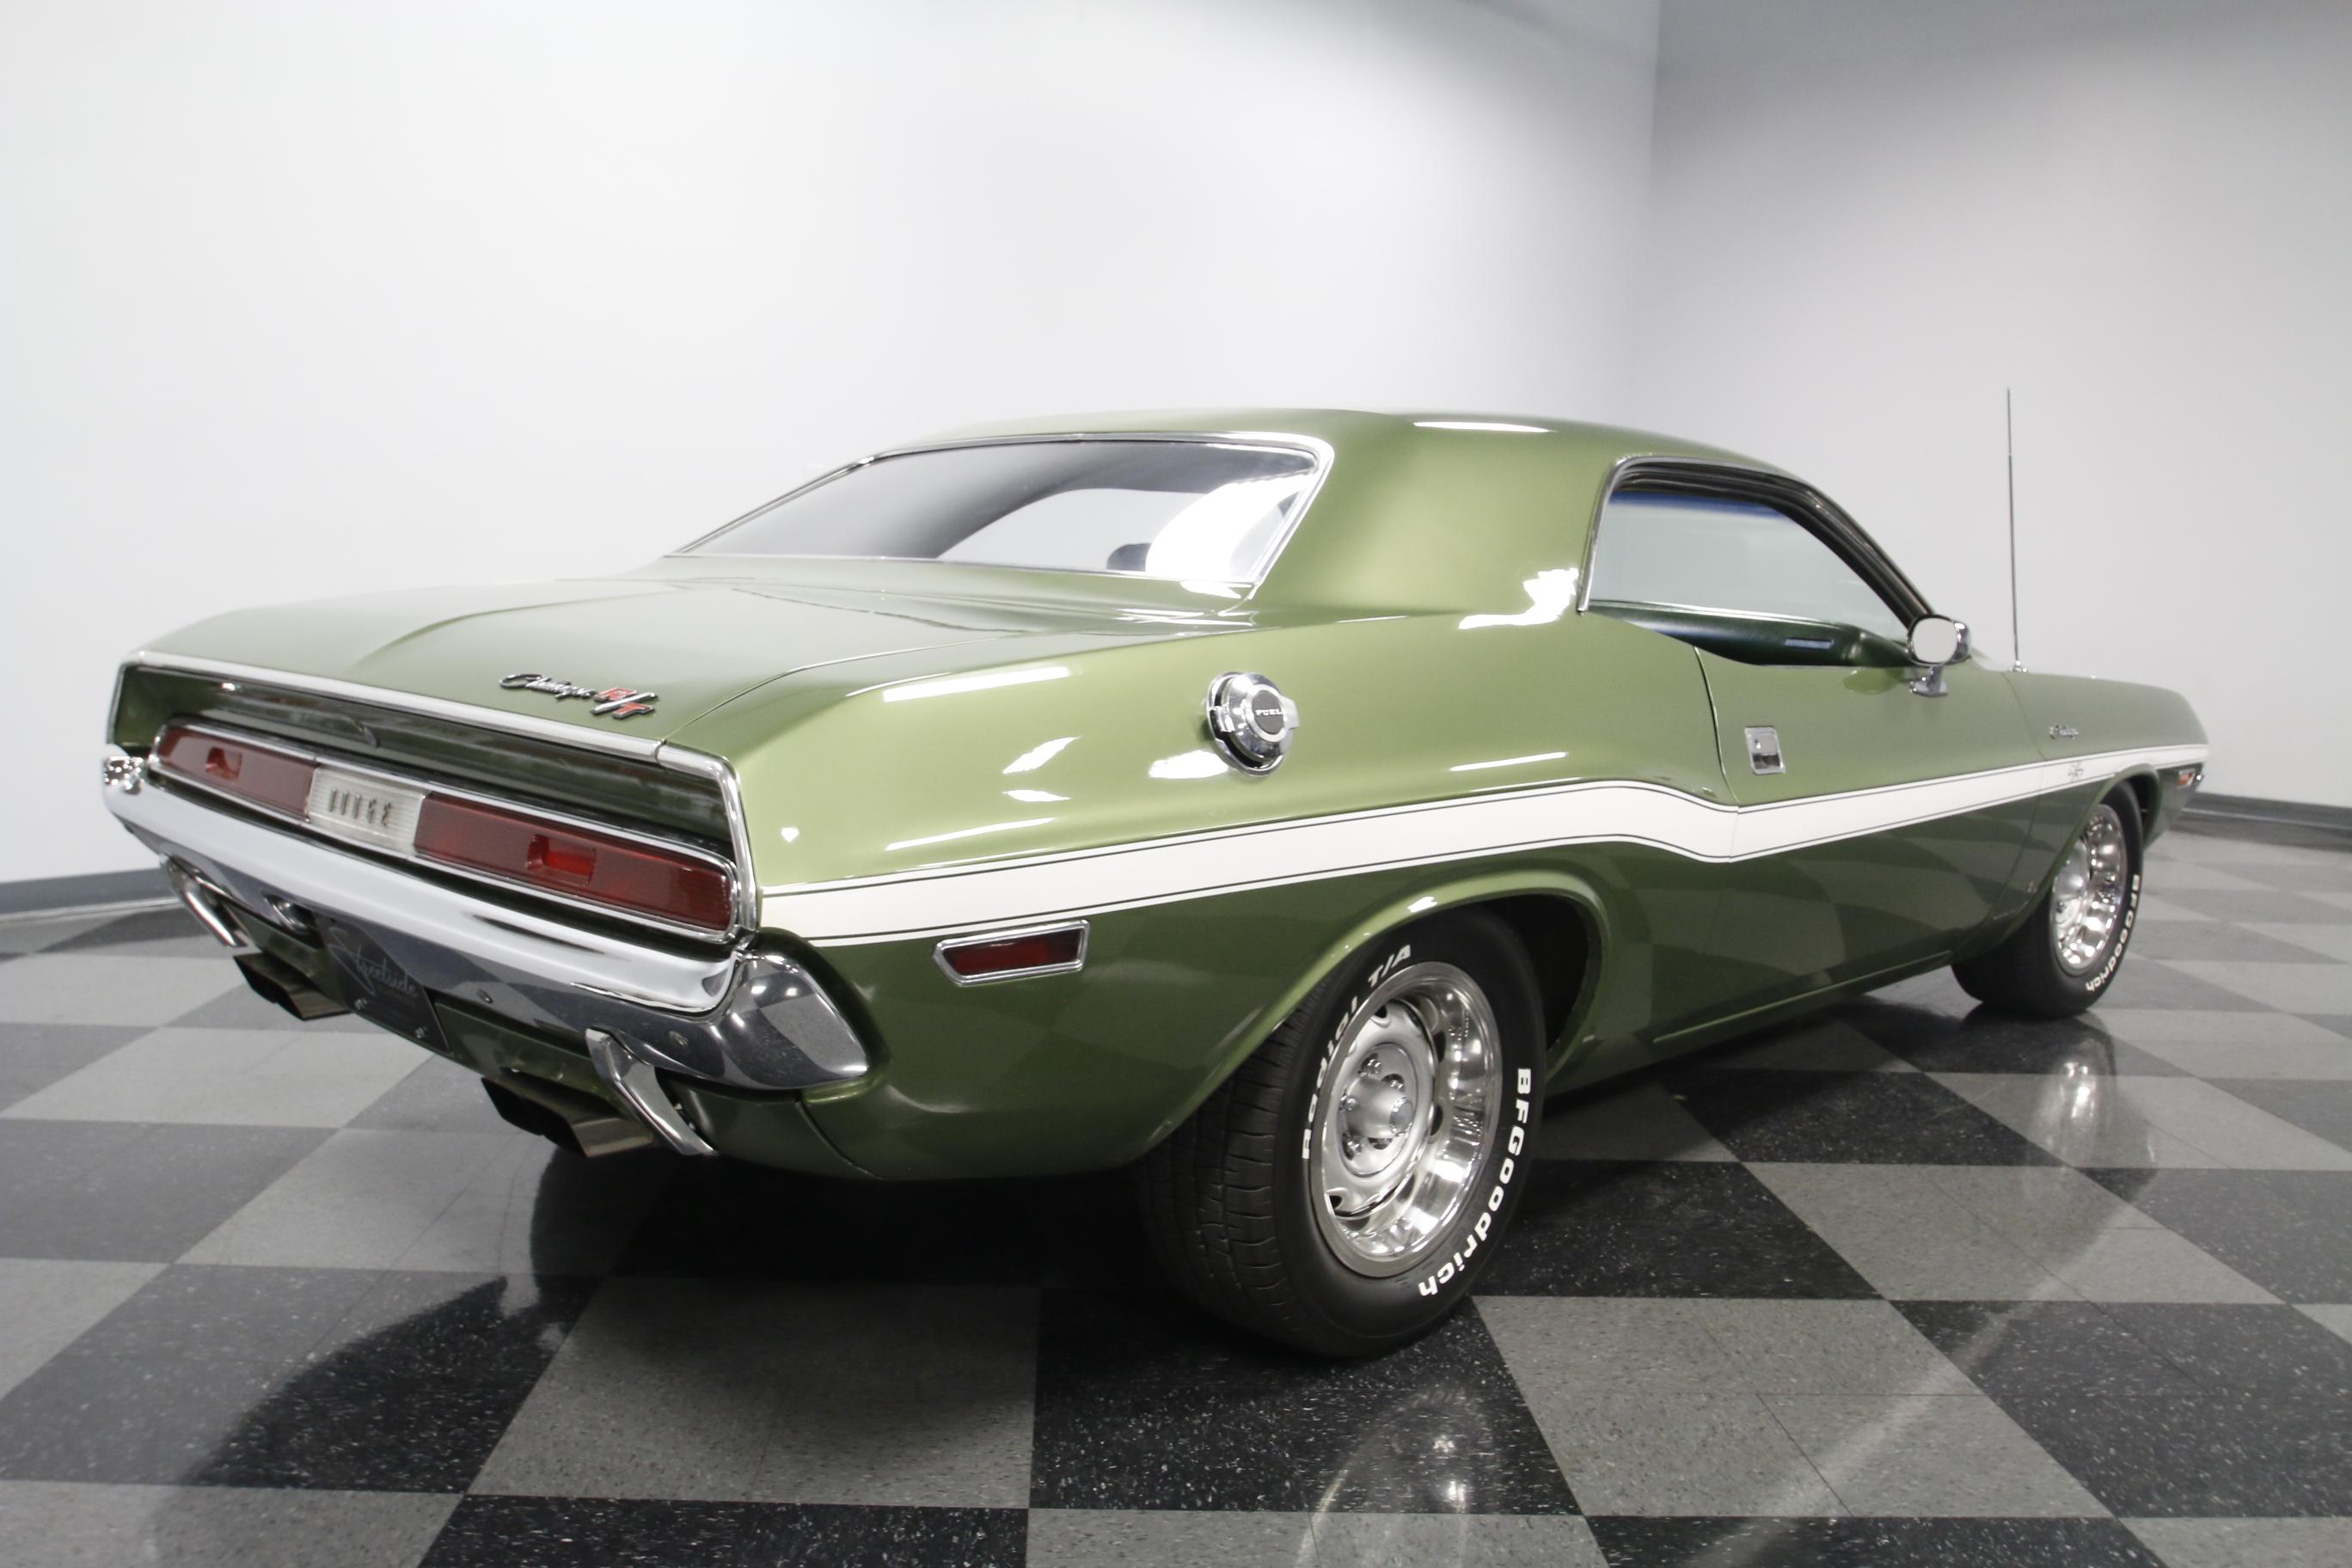 4408-CHA | 1970 Dodge Challenger R/T | Streetside Classics